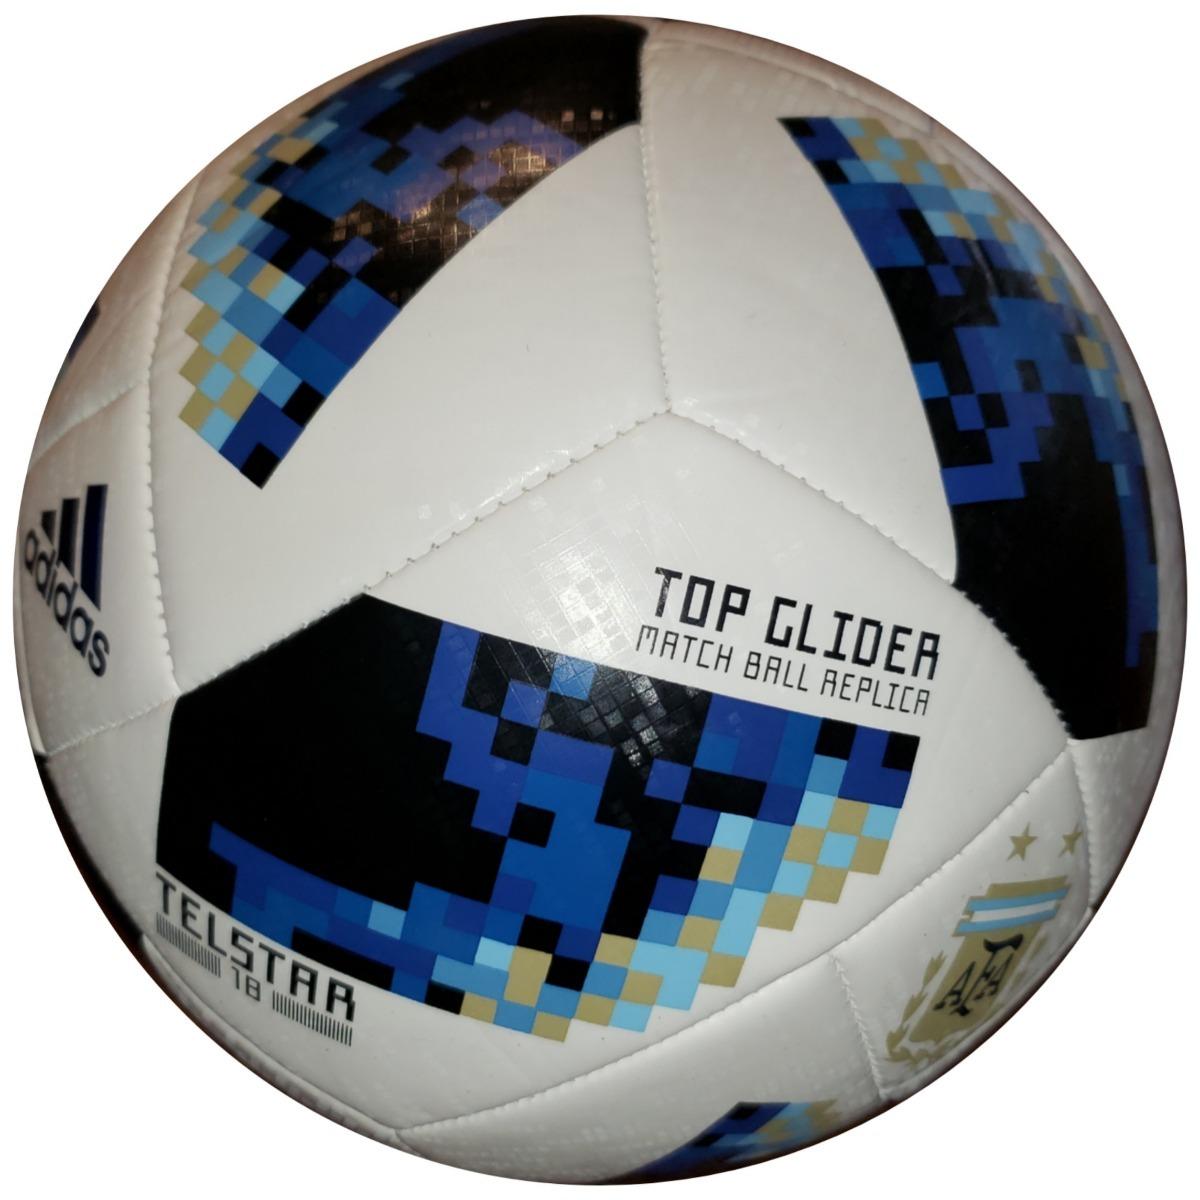 62a6ddeaaae25 pelota fútbol adidas telstar 18 afa - top glider. Cargando zoom.